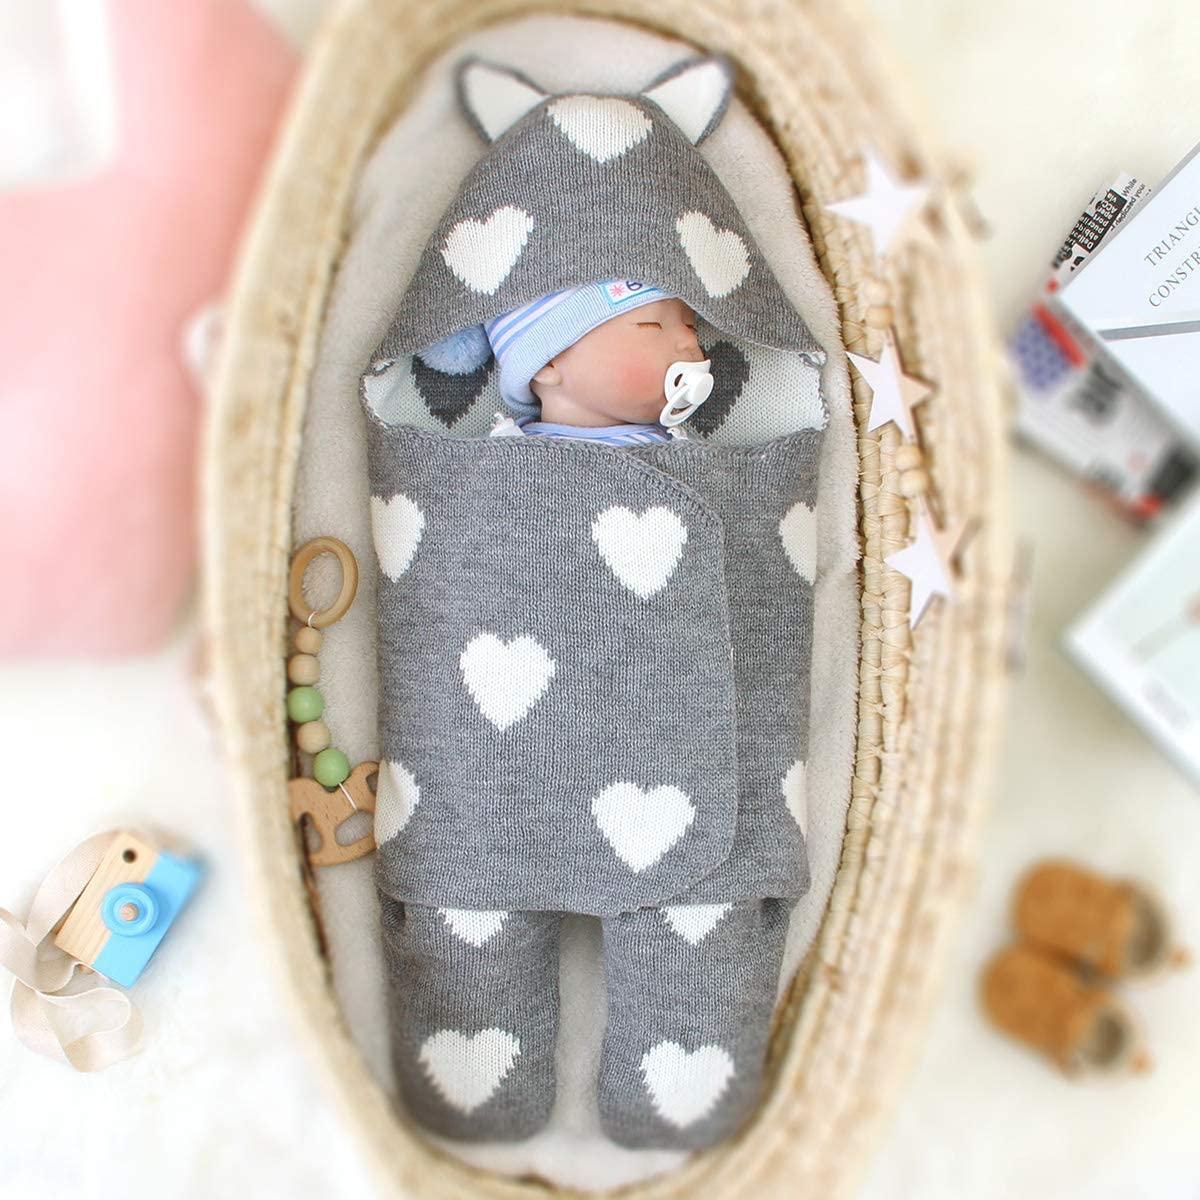 Haokaini Newborn Baby Blanket Knit Wrap Swaddle Blanket Sleeping Bag Stroller Wrap Multifunctional Baby Boy Girl Romper Blanket for Winter Autumn 0-6 Months (Grey)